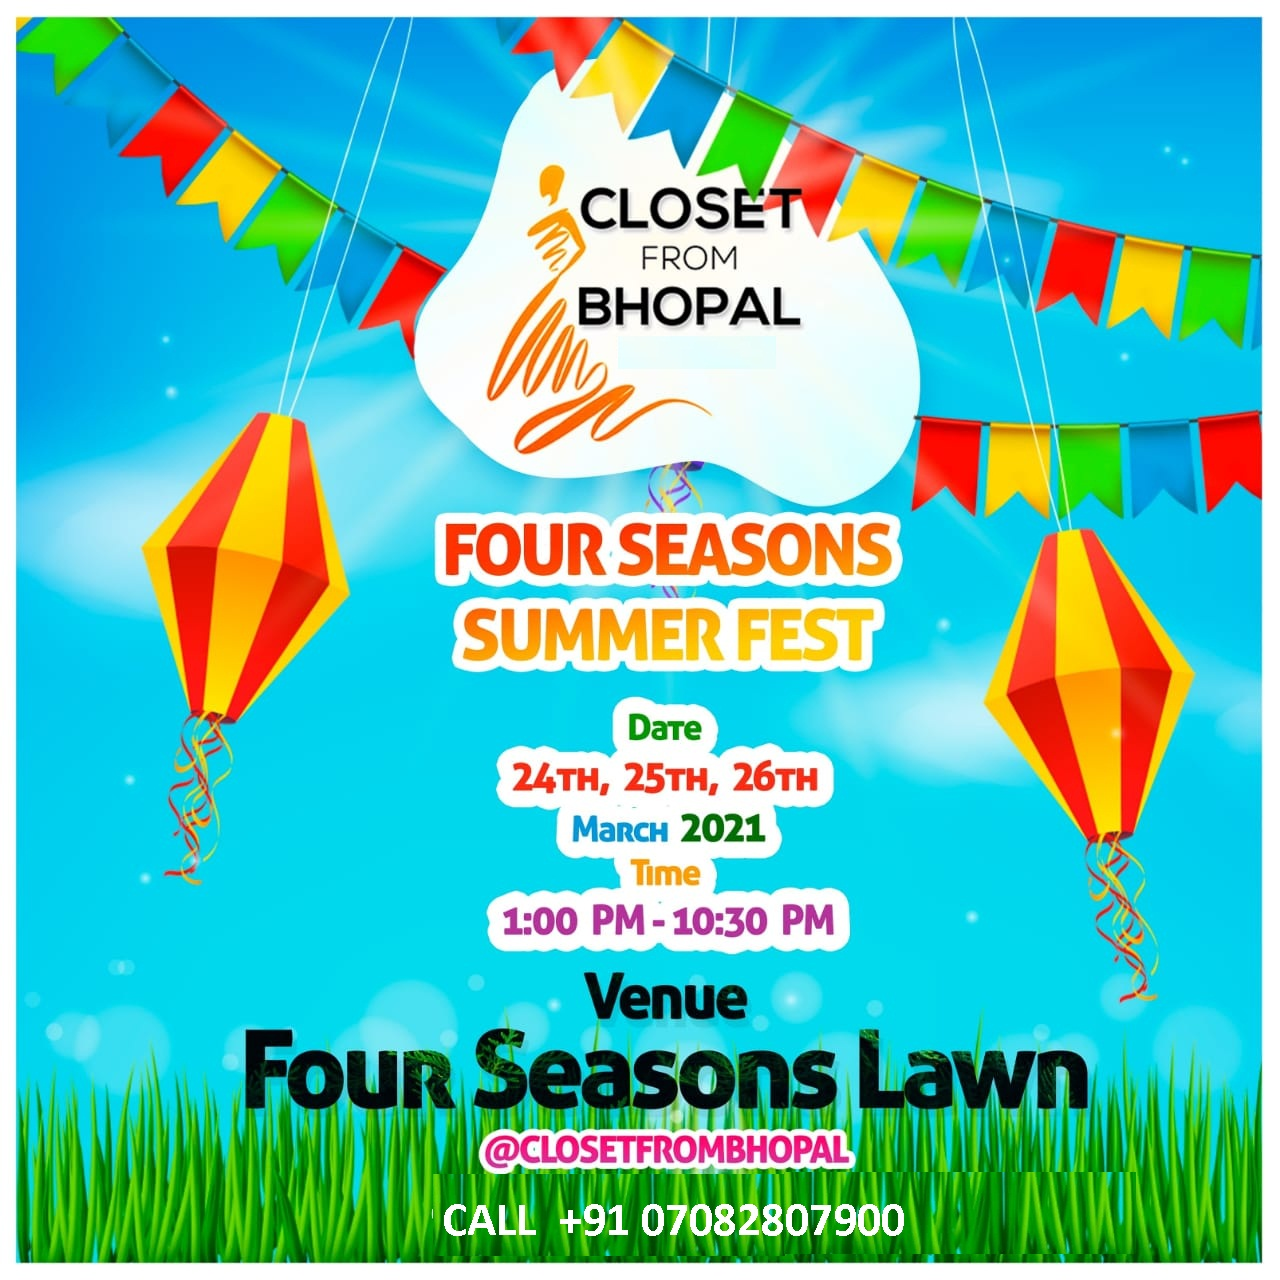 Four Seasons Summer Fest